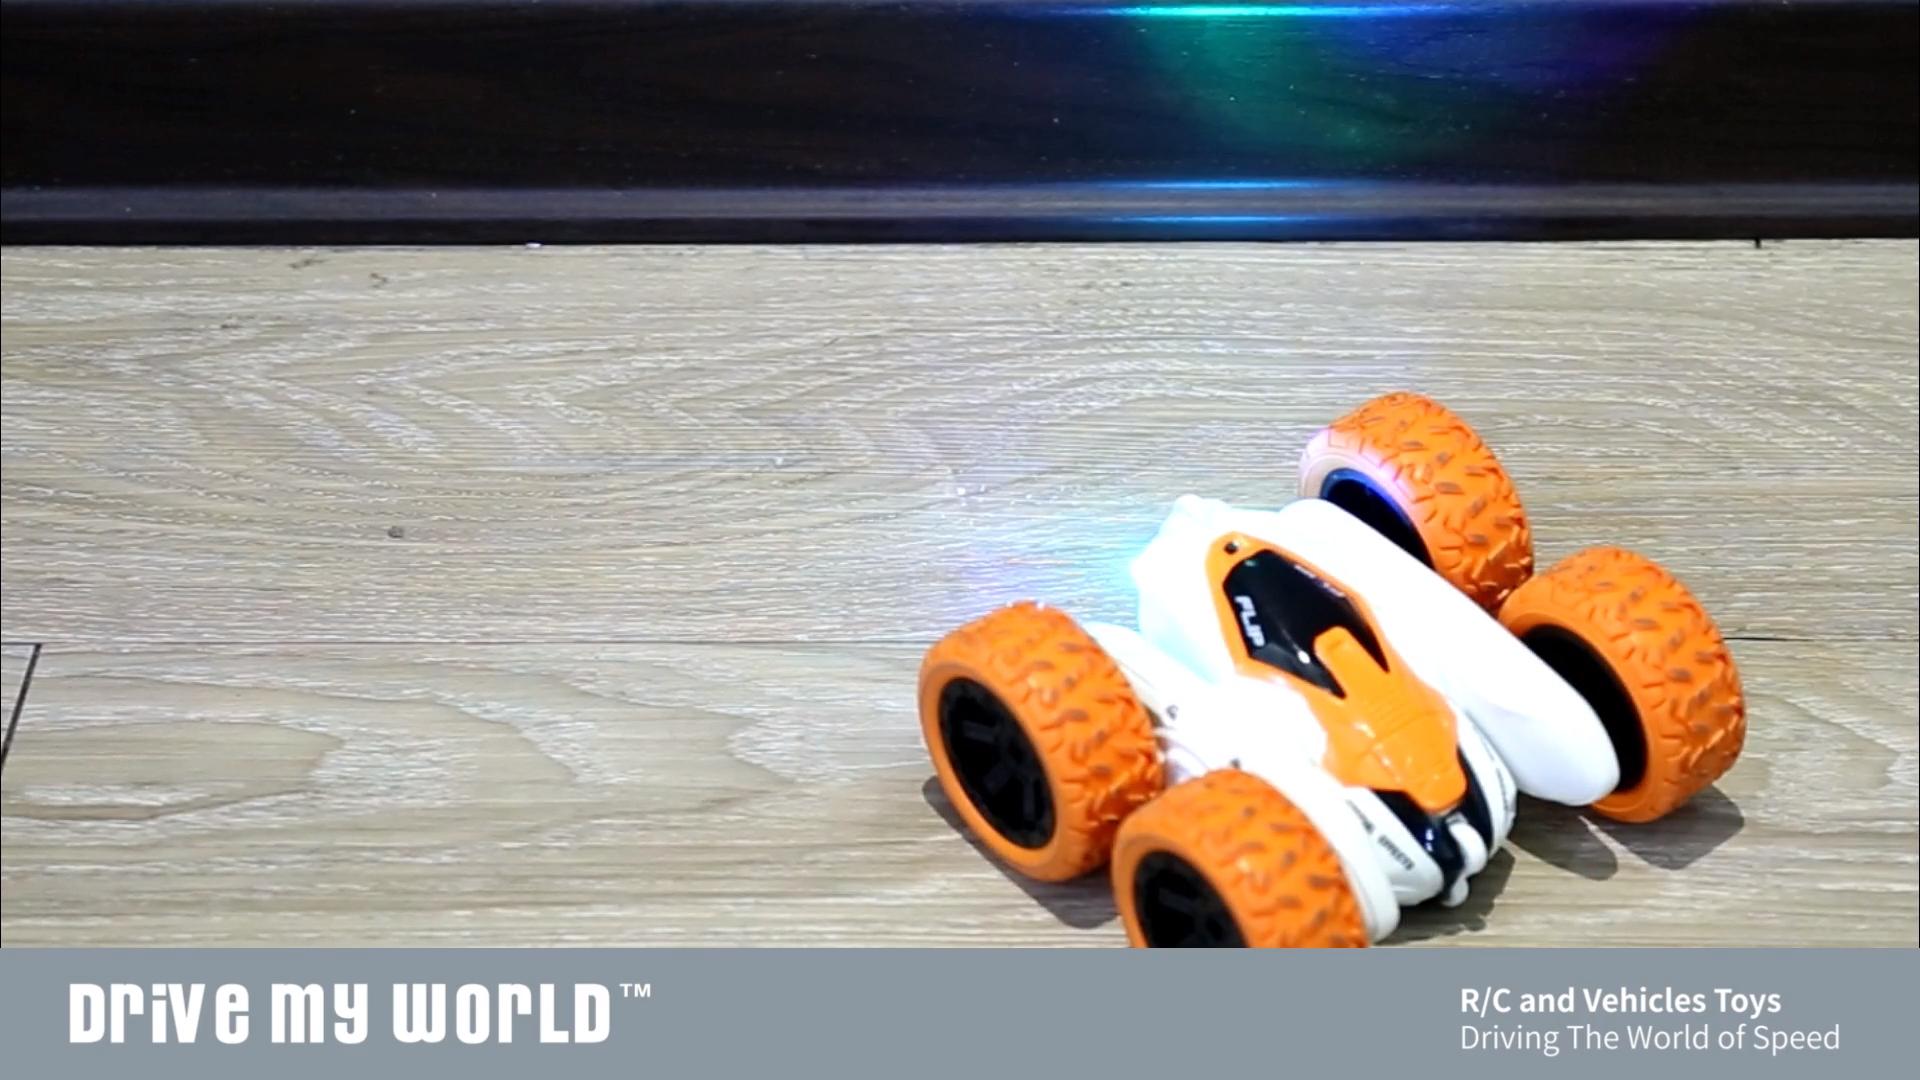 2021 Kids Off Road Rock Crawler 360 Degree Rotating Stunt Watch Remote Control RC Car Radio Control Toy